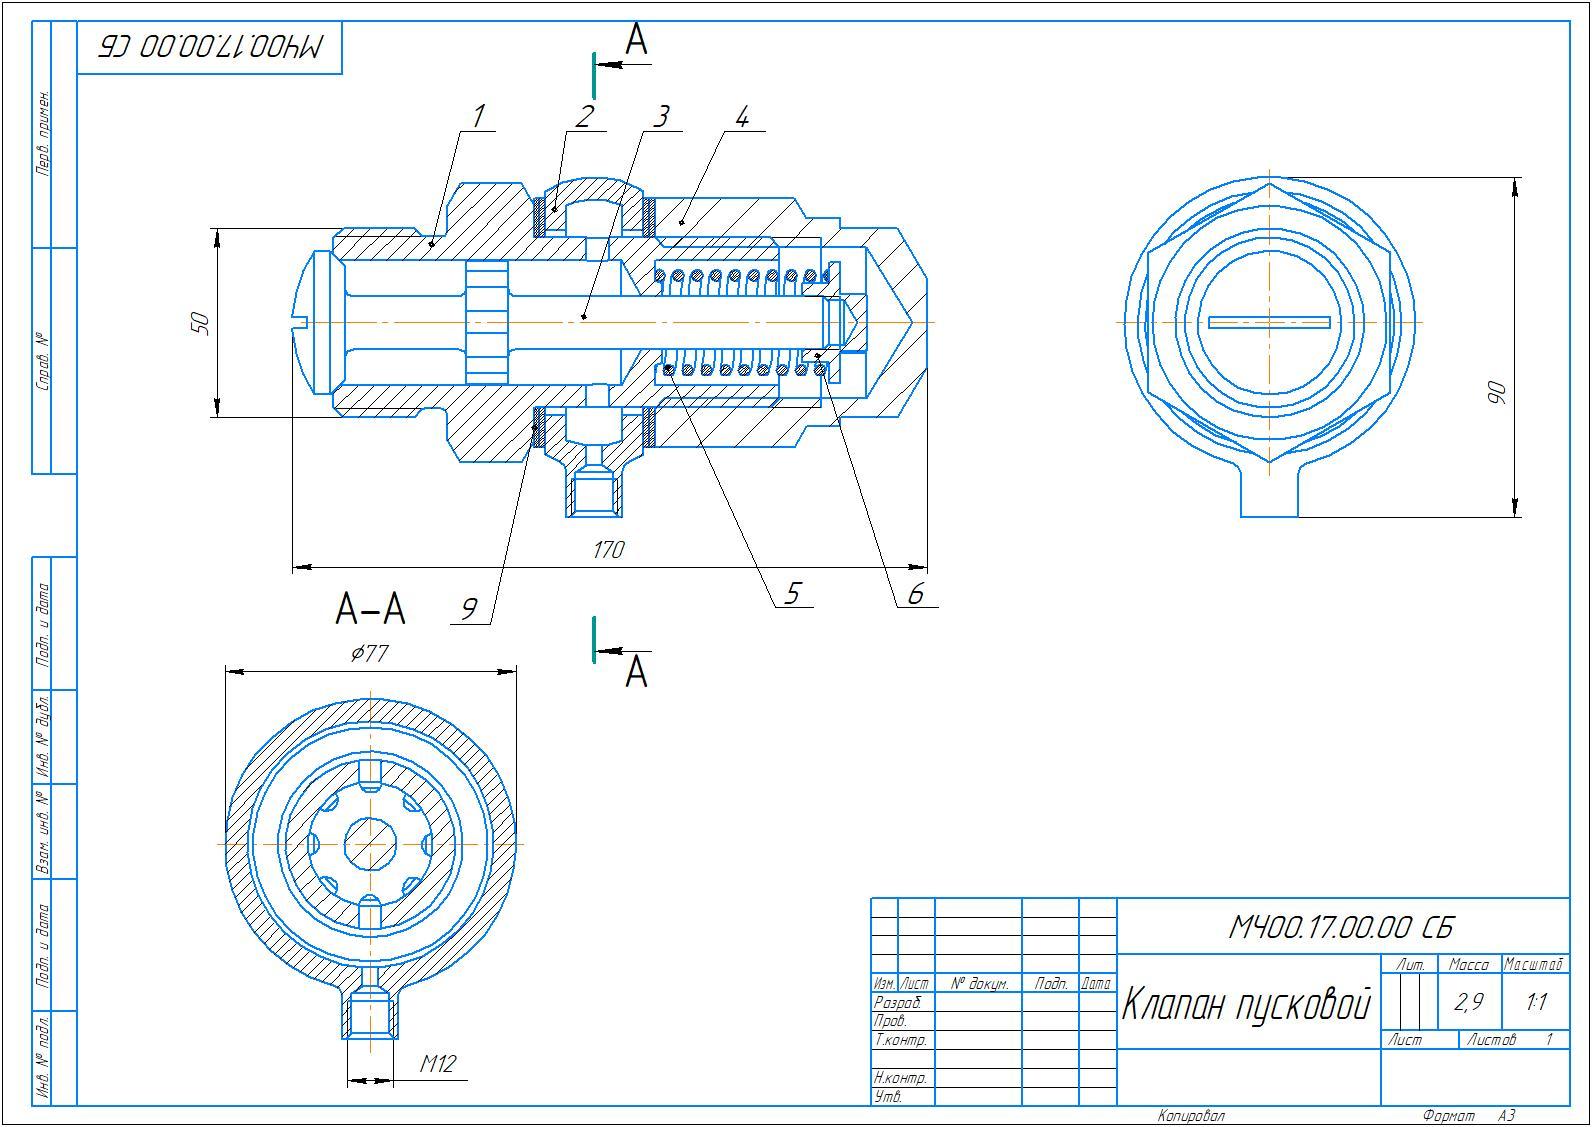 МЧ00.17.00.00 СБ - Клапан пусковой сборочный чертеж